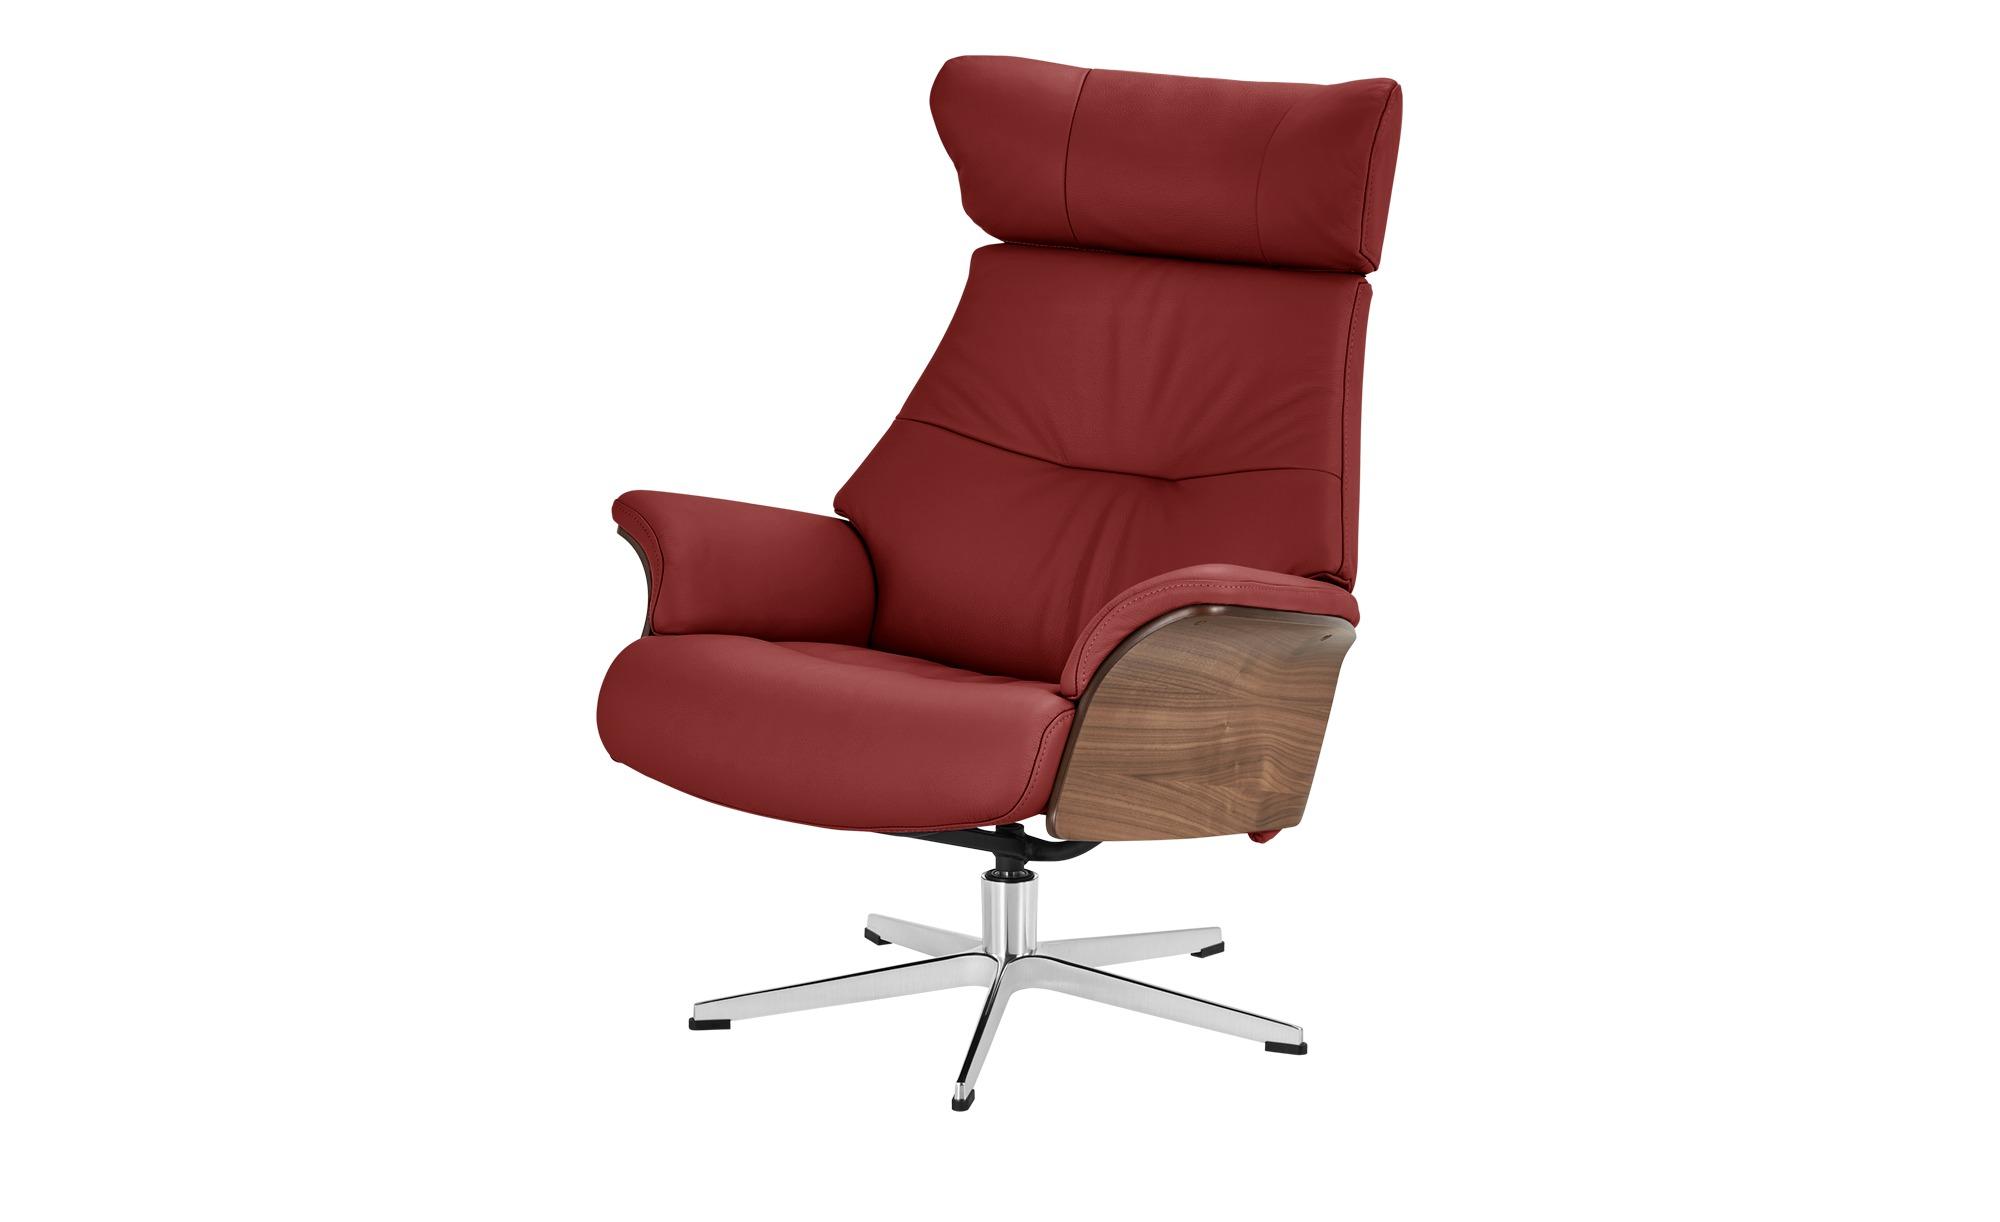 Relaxsessel rot - Leder Air ¦ rot ¦ Maße (cm): B: 80 H: 101 T: 78 Polstermöbel > Sessel > Fernsehsessel - Höffner